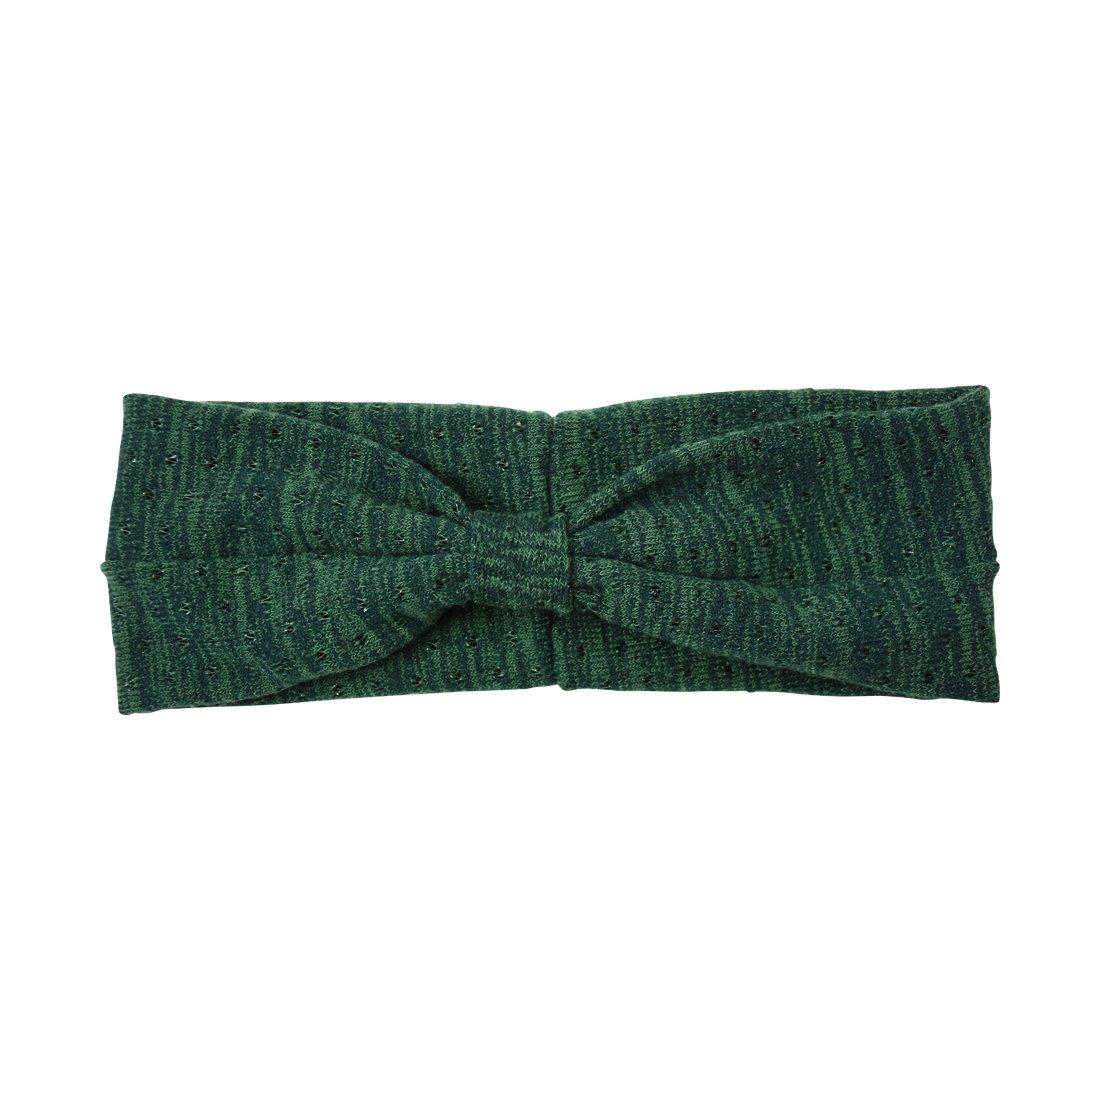 Grey Knit Winter Turband...